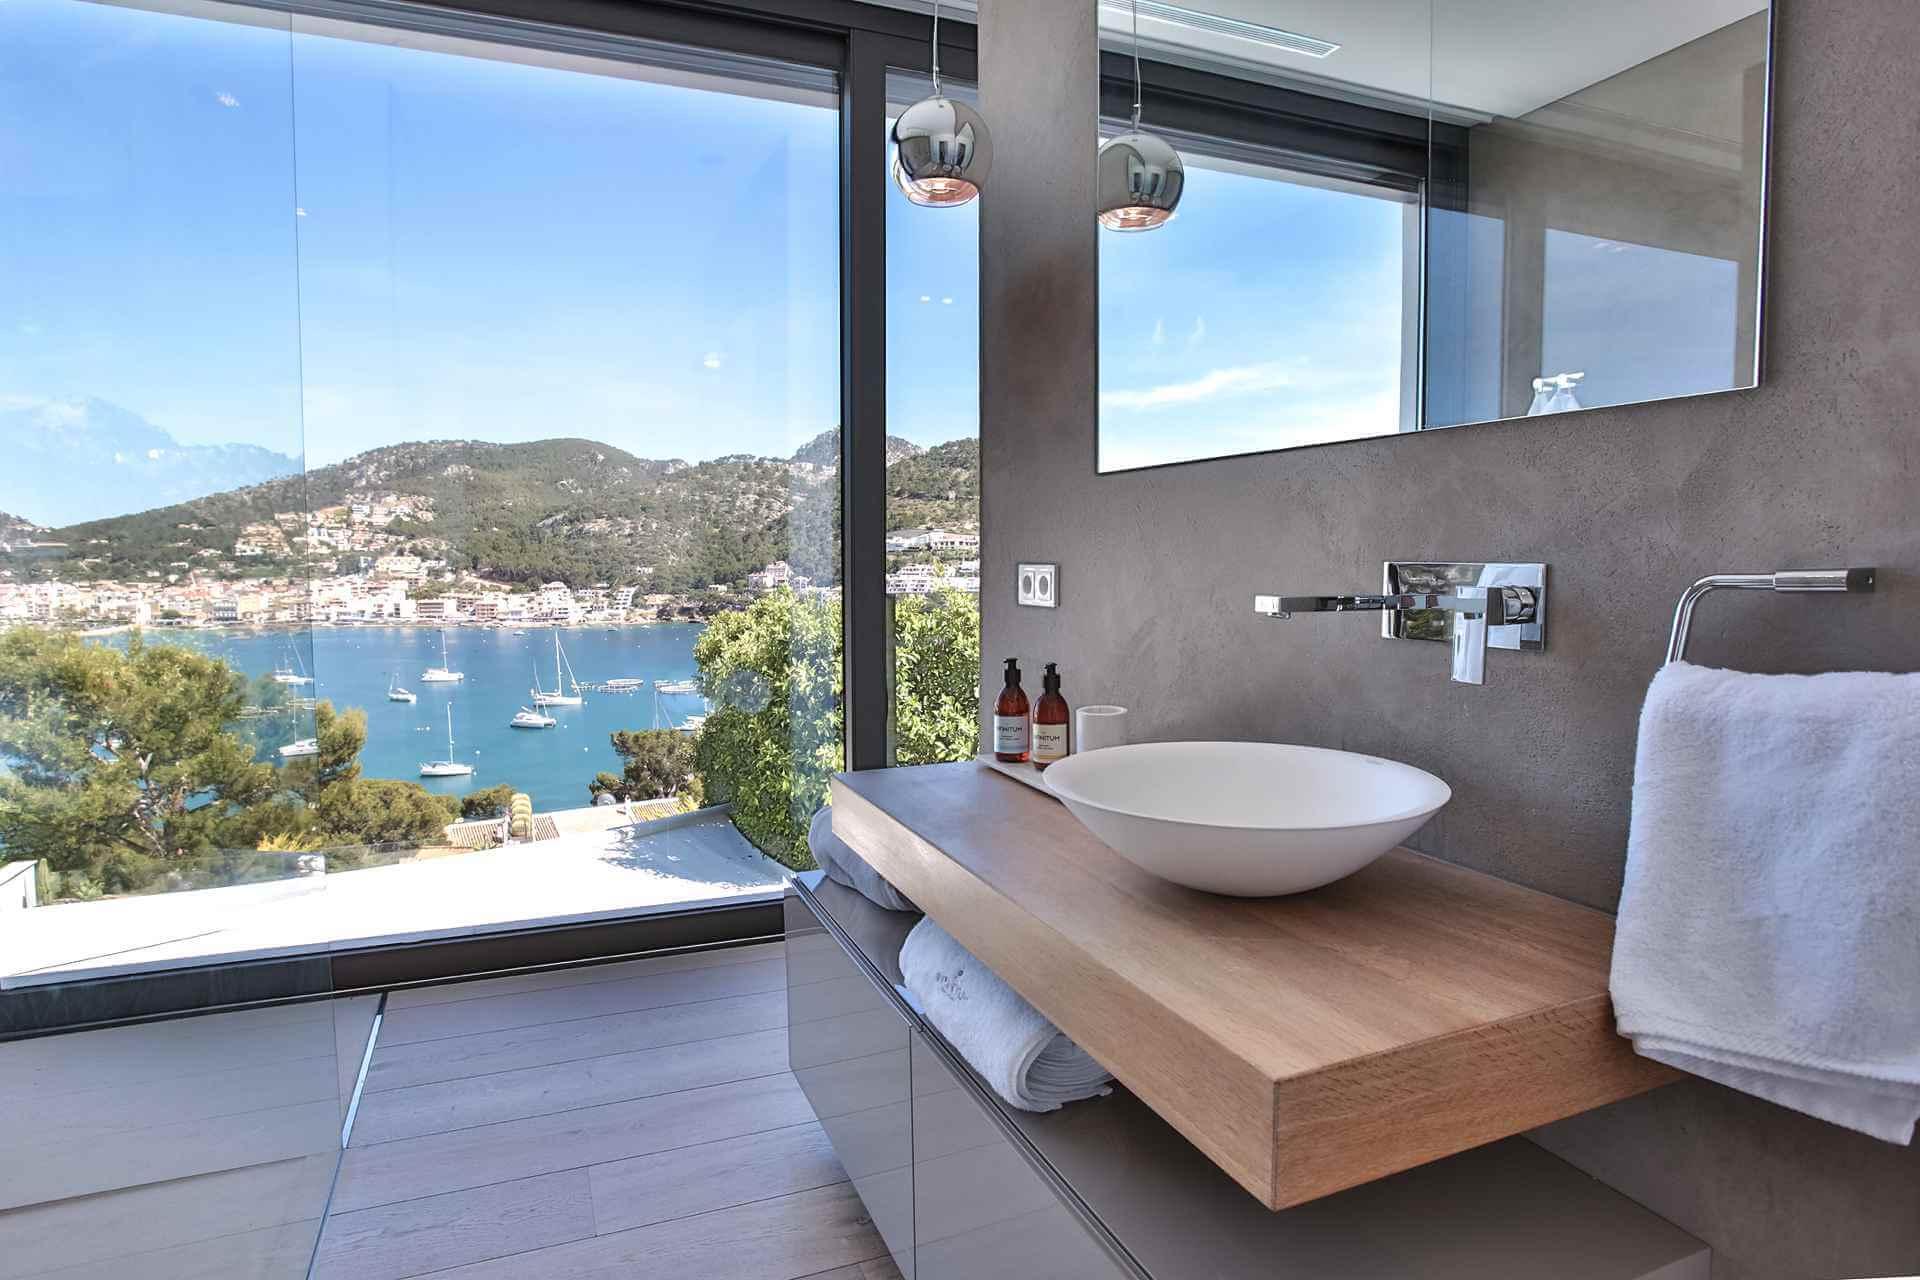 01-353 Villa with indoor pool Mallorca Southwest Bild 22